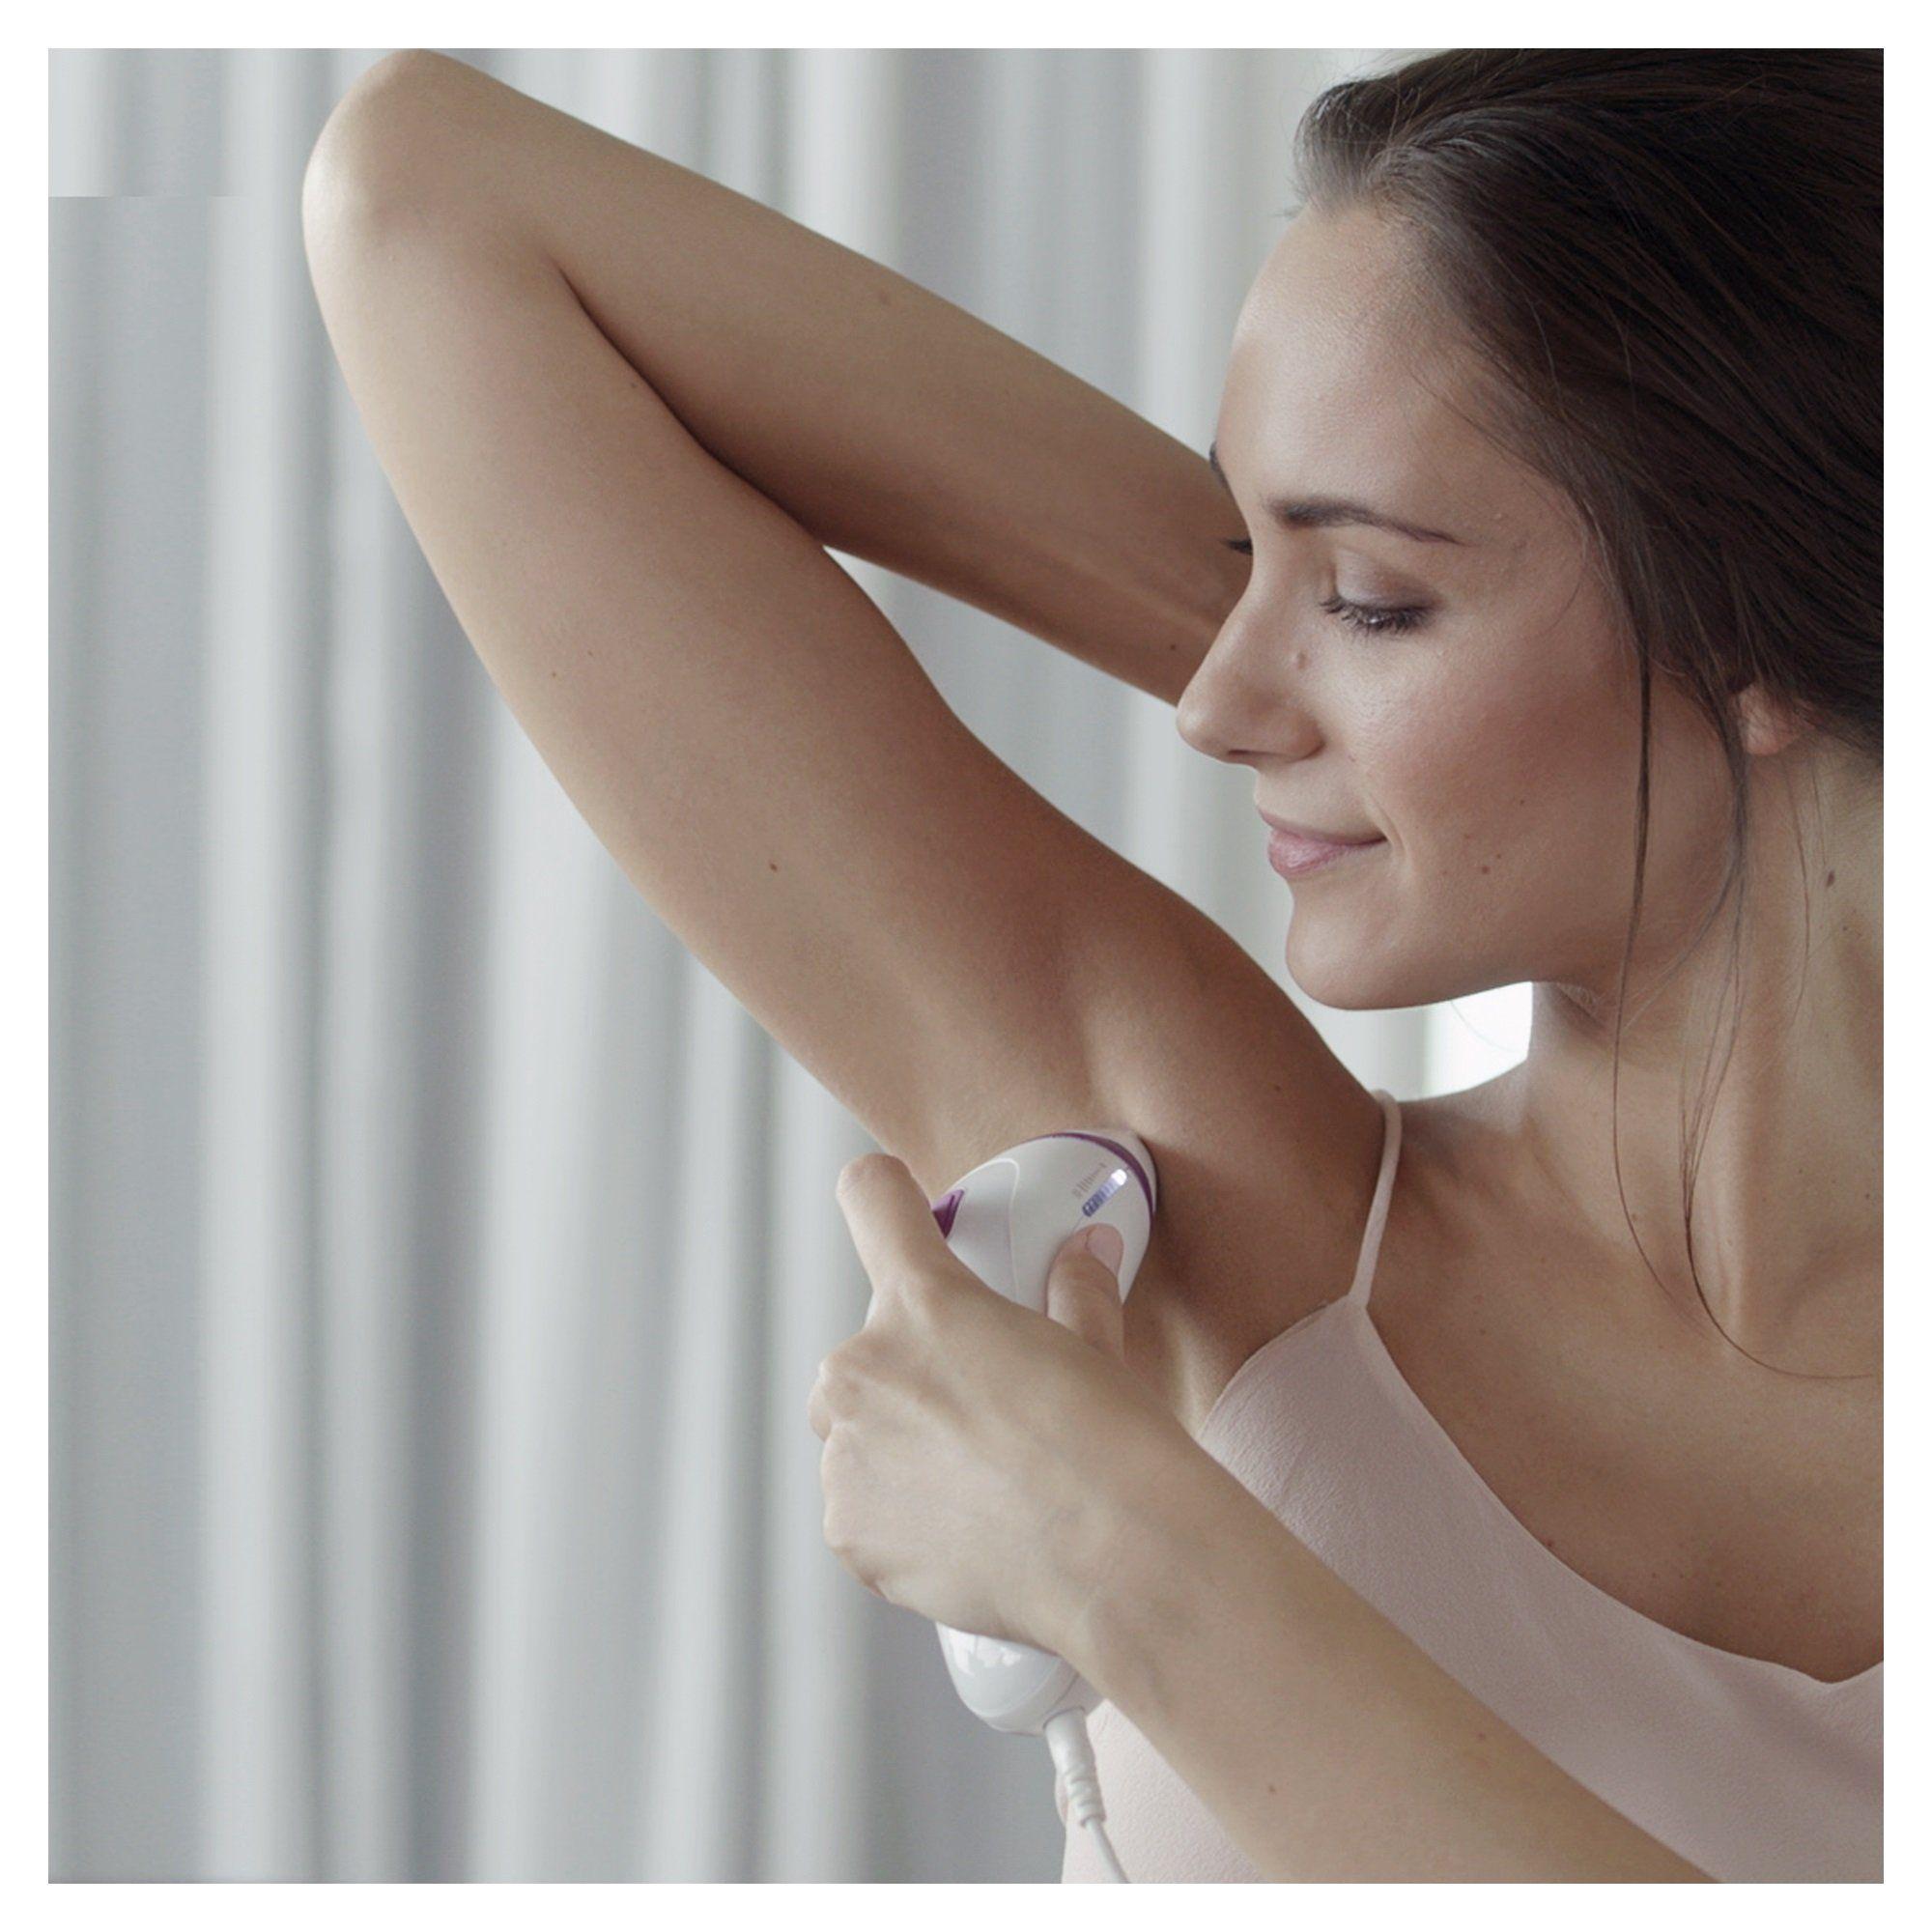 Acne Scar Removal Braun Gillette Venus Silkexpert Ipl 3001